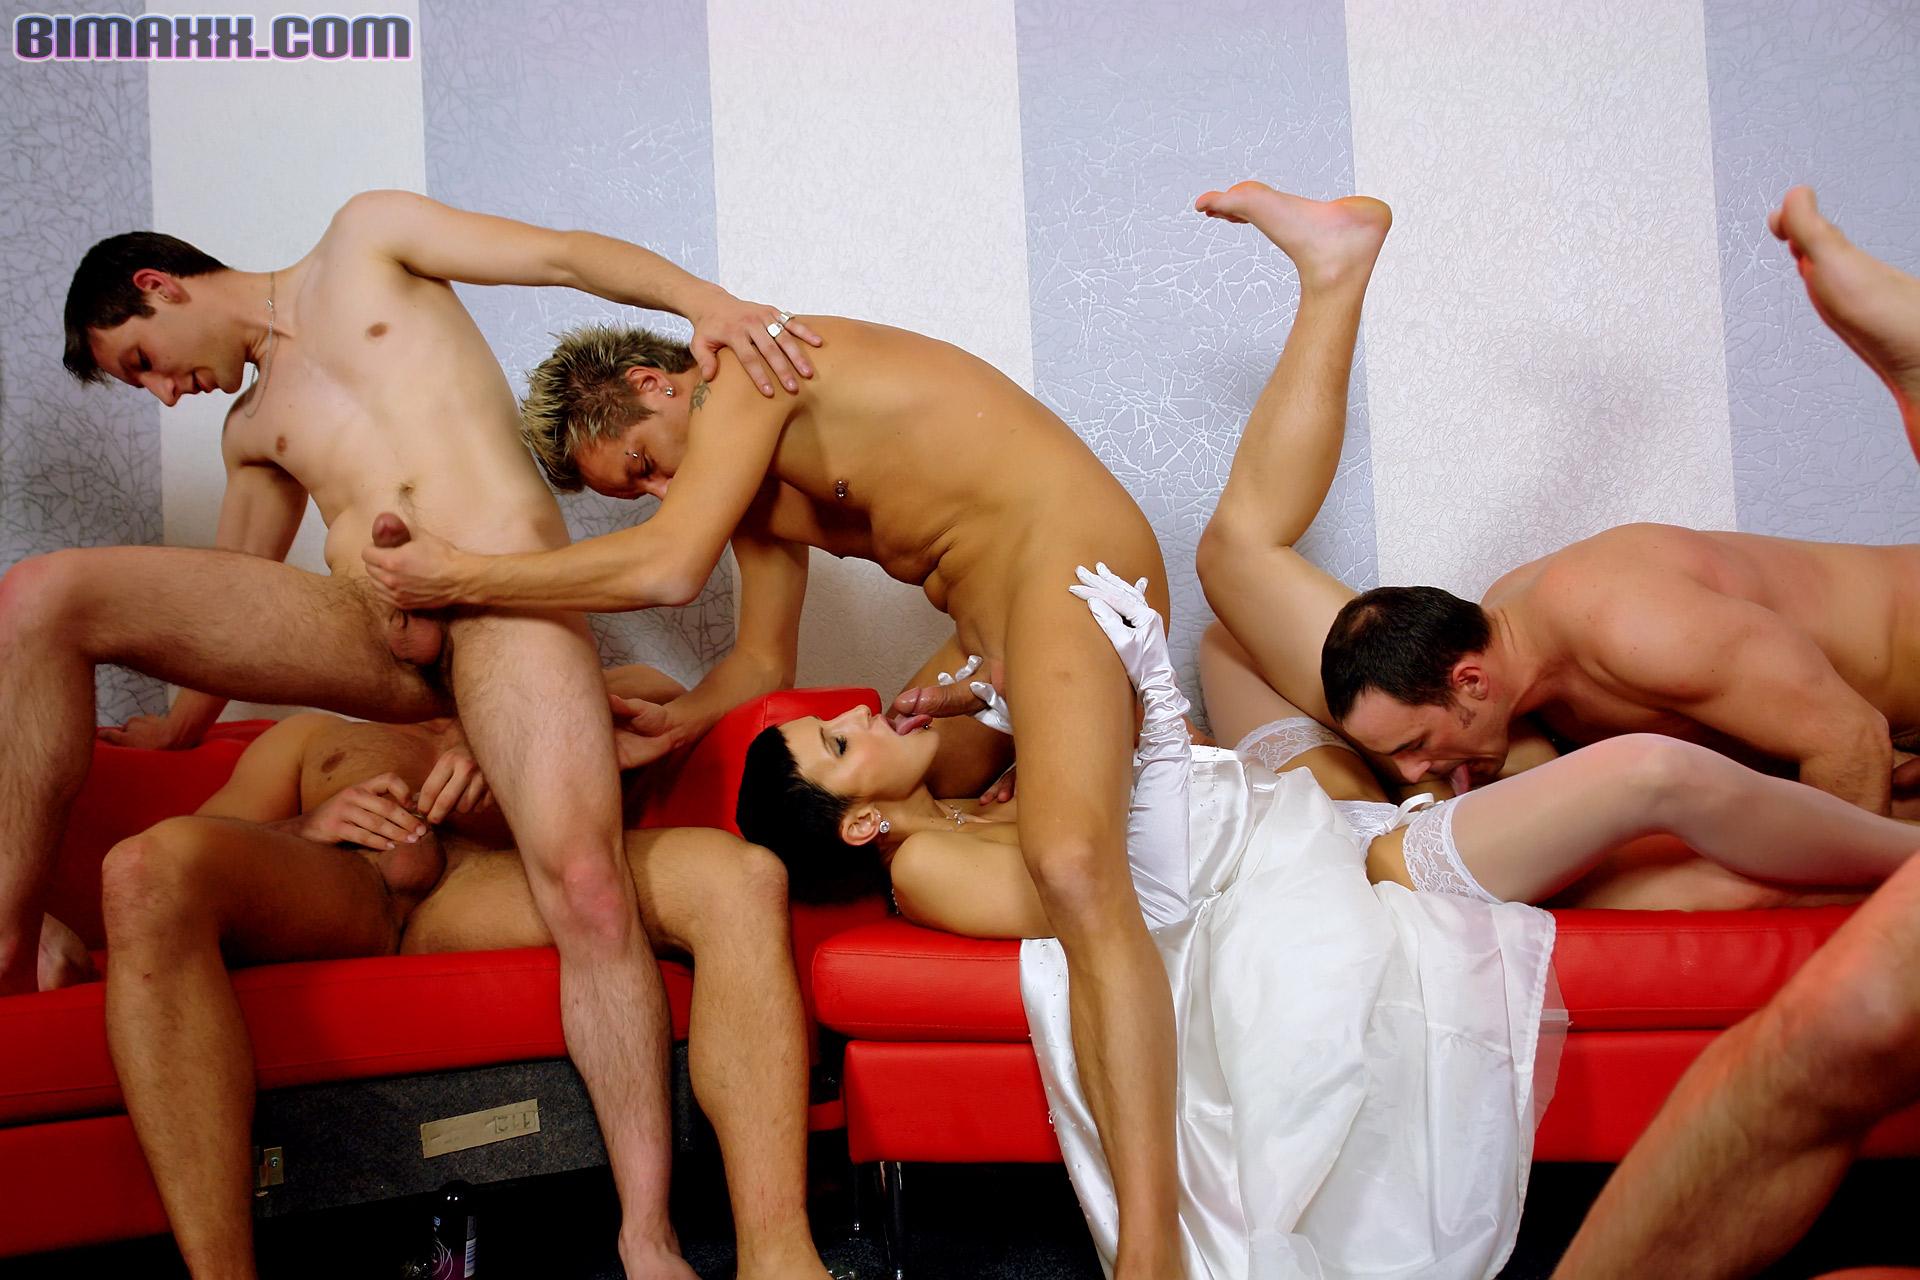 biseksuali-gruppa-video